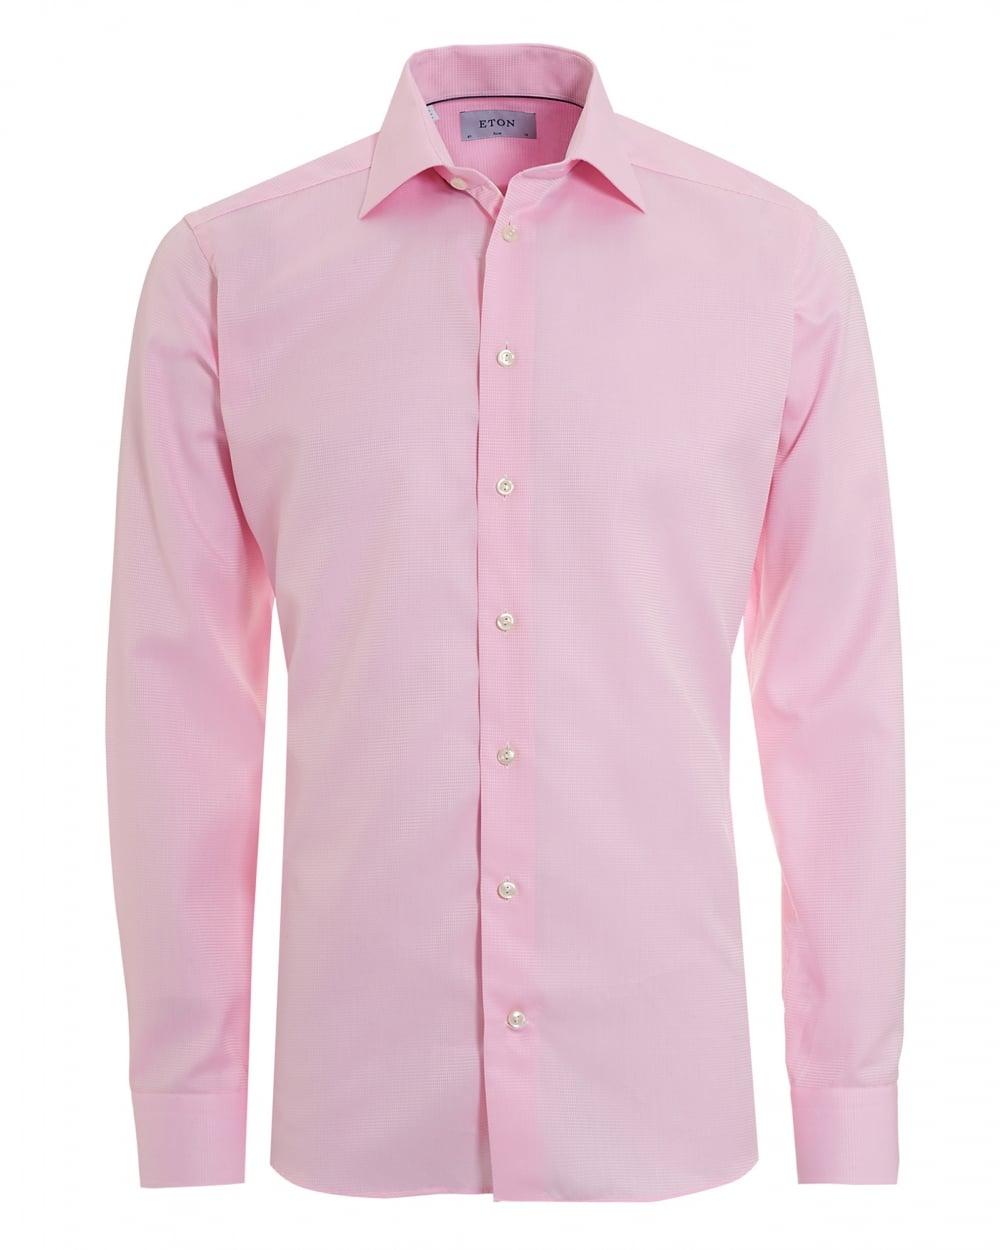 Eton shirts mens woven twill slim fit pink shirt for Mens pink shirts uk